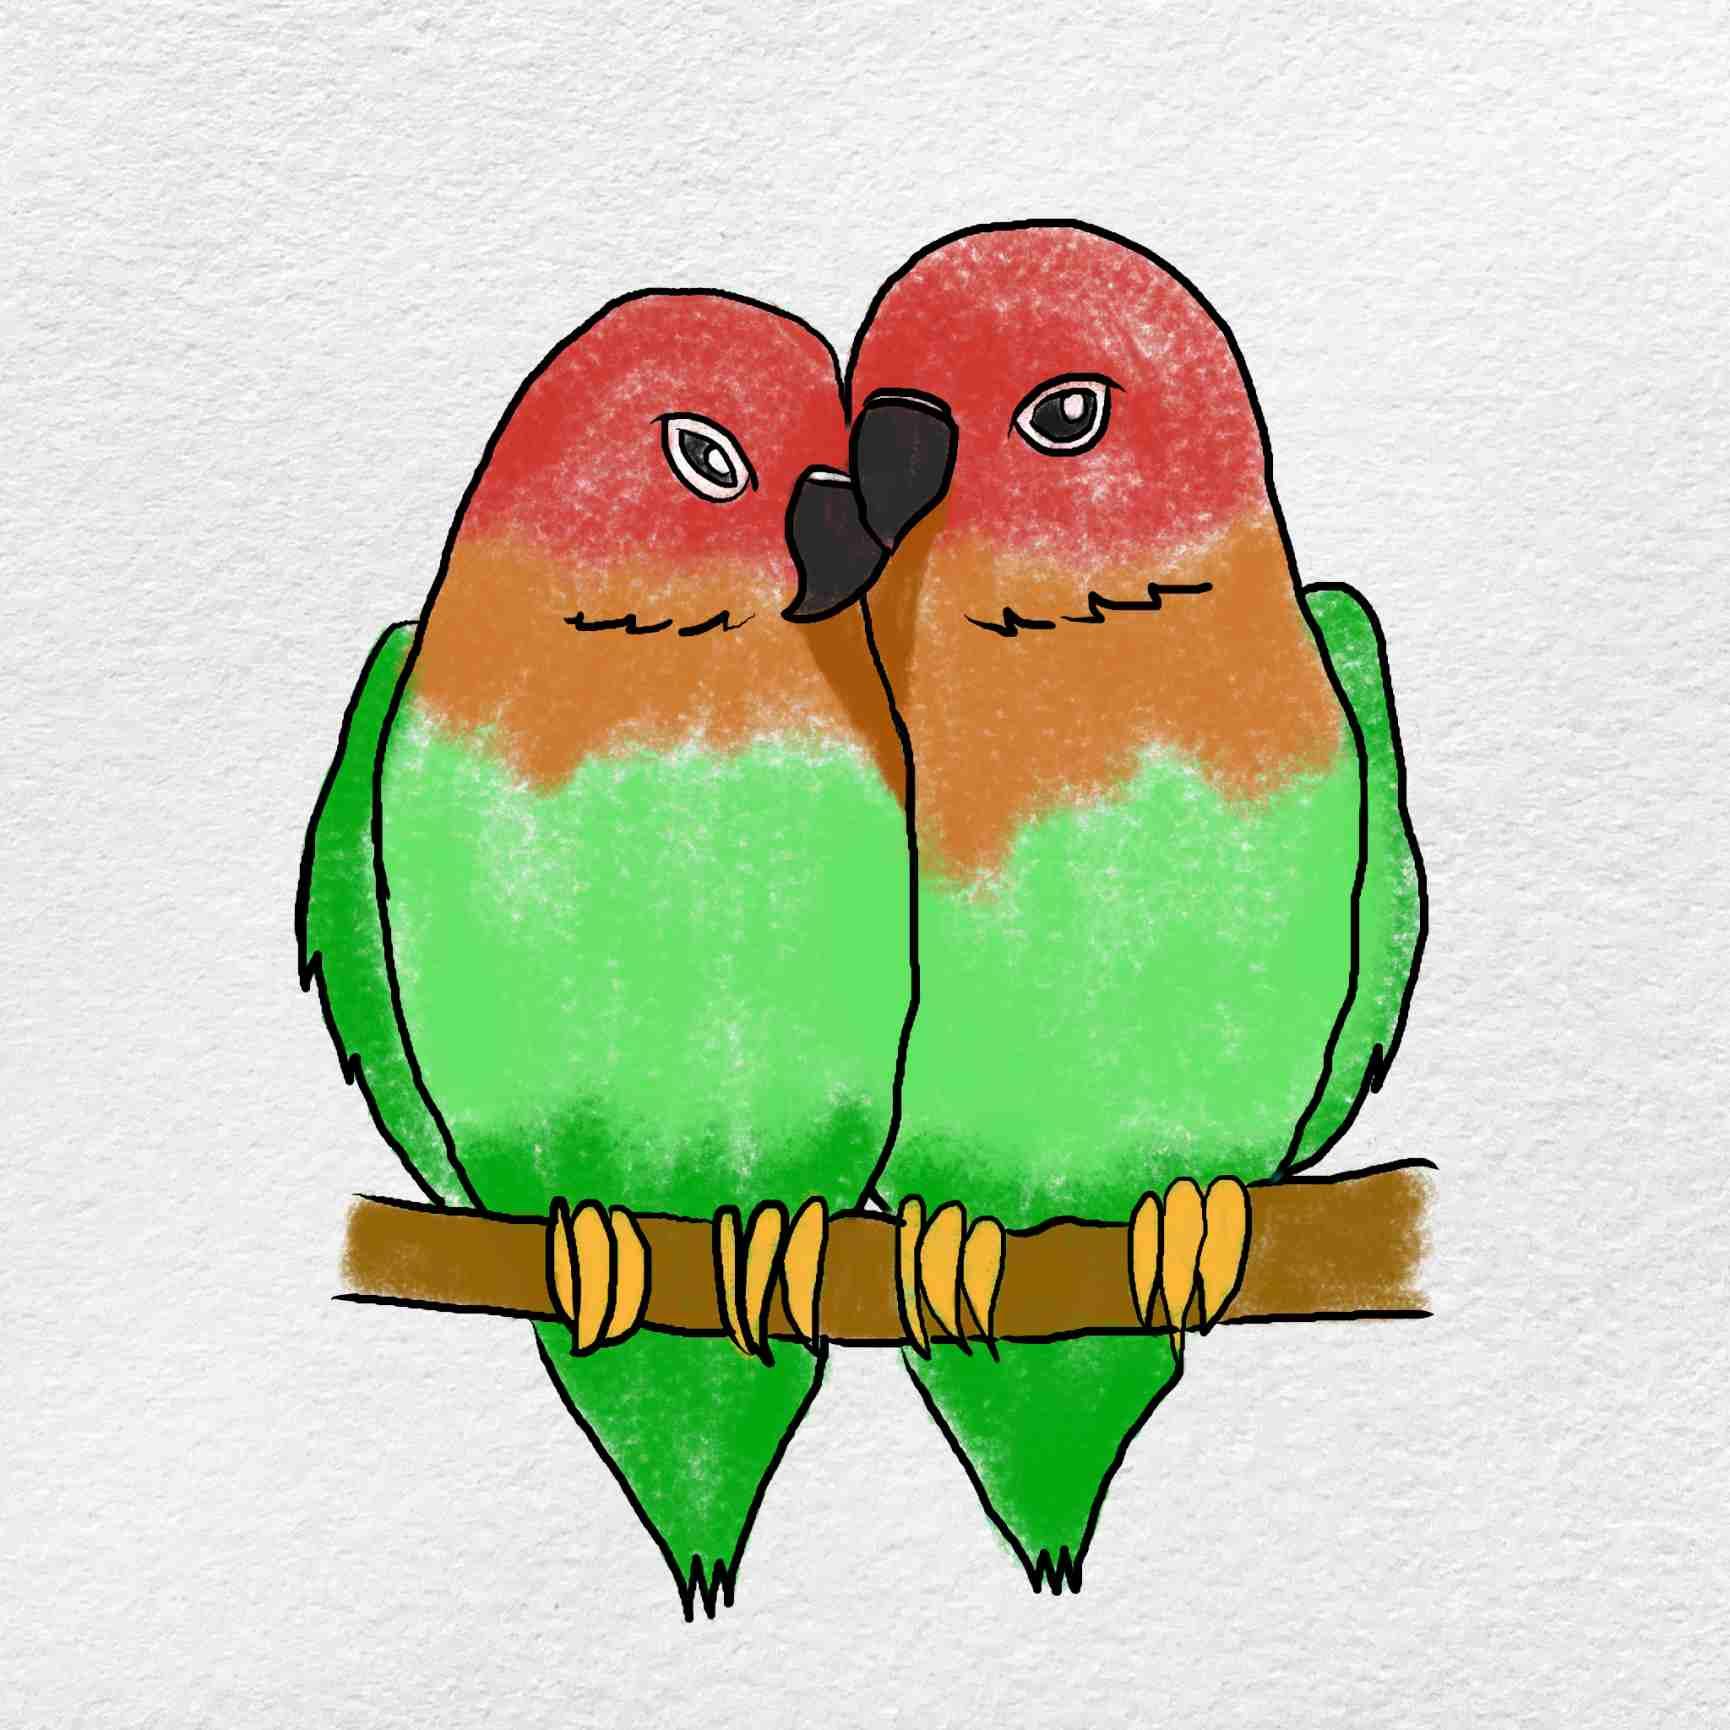 How To Draw Love Birds: Step 6